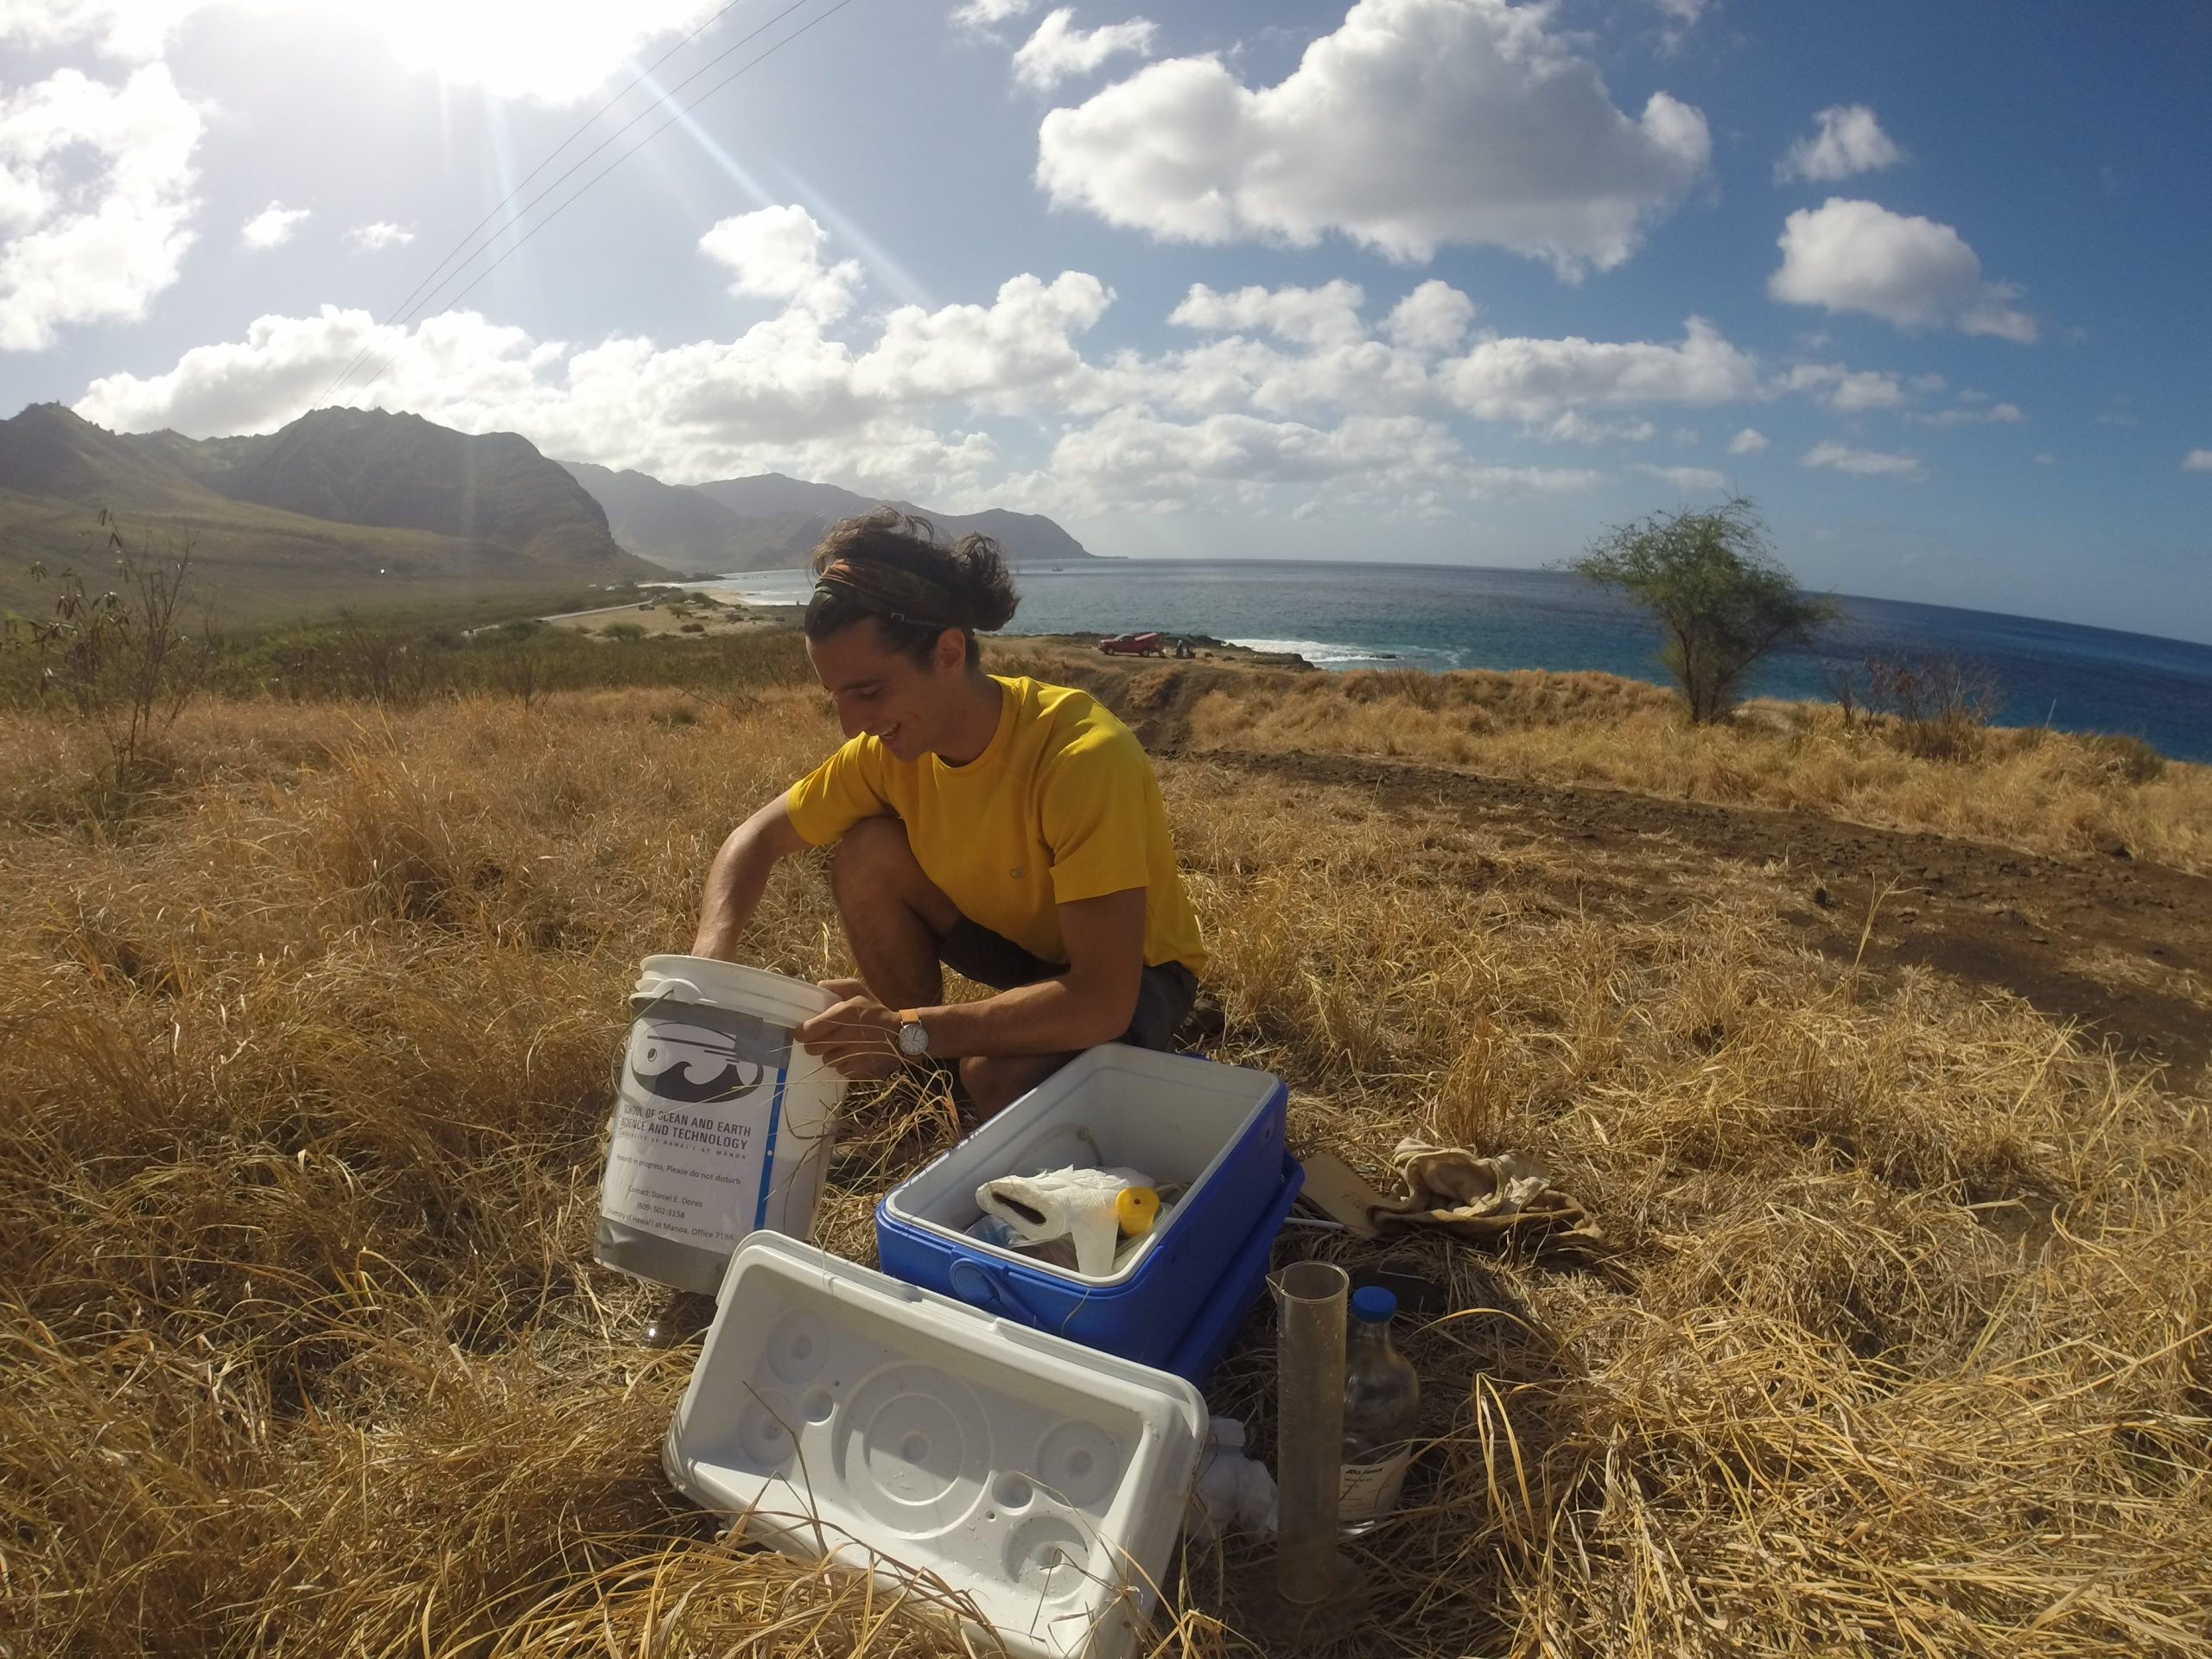 Daniel Dores, lead author, preparing rainfall collection equipment, West O'ahu.